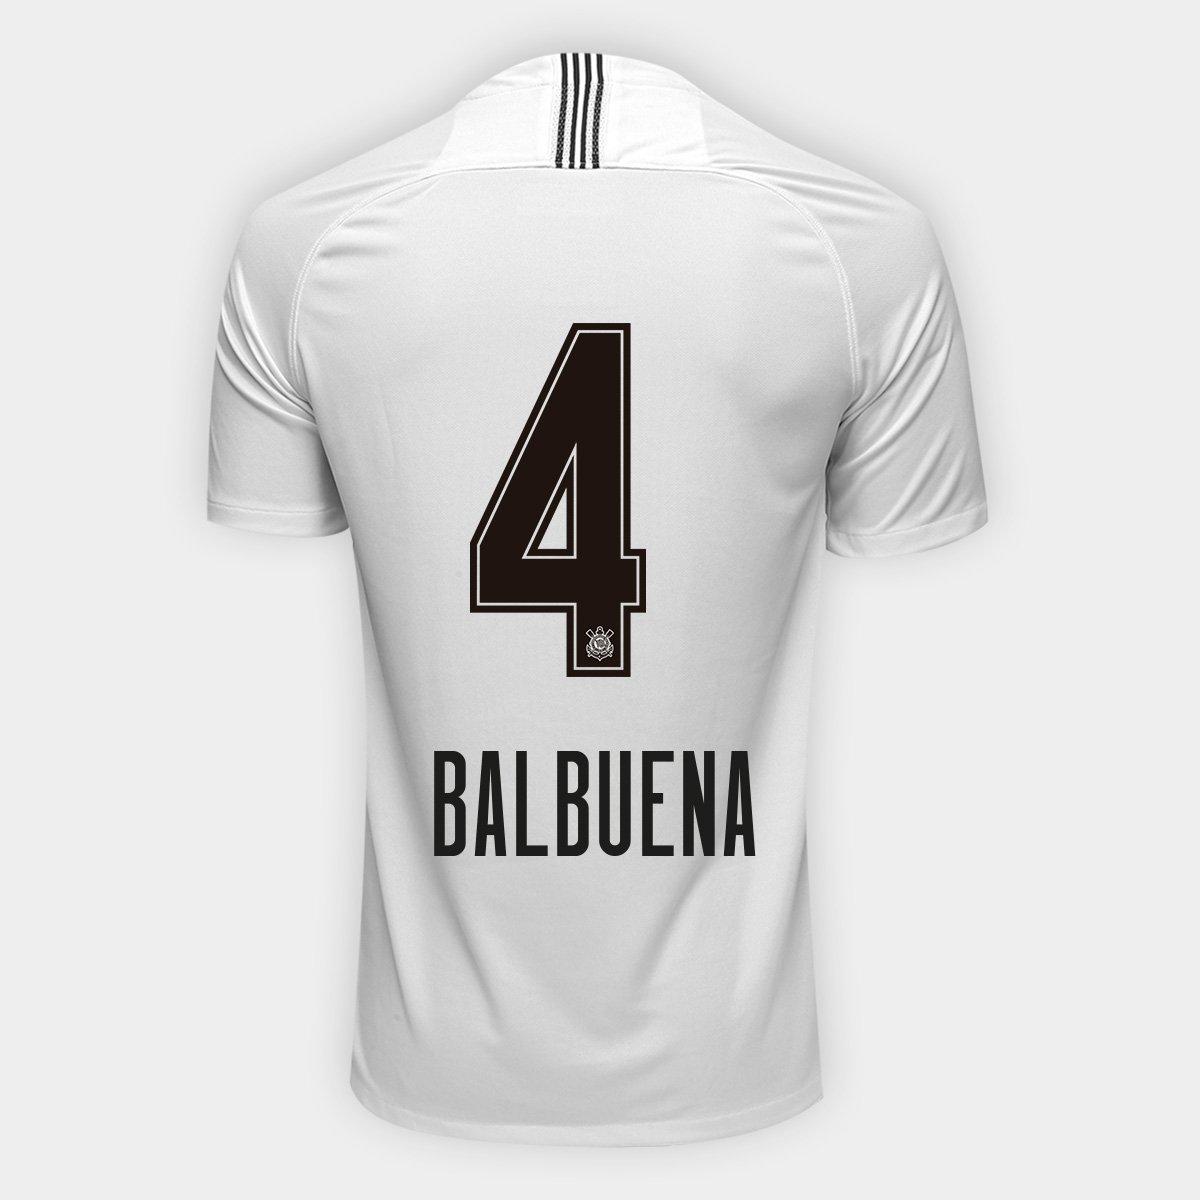 83a83047a12ce Camisa Corinthians I 18/19 Nº 4 Balbuena - Torcedor Nike Masculina    Netshoes